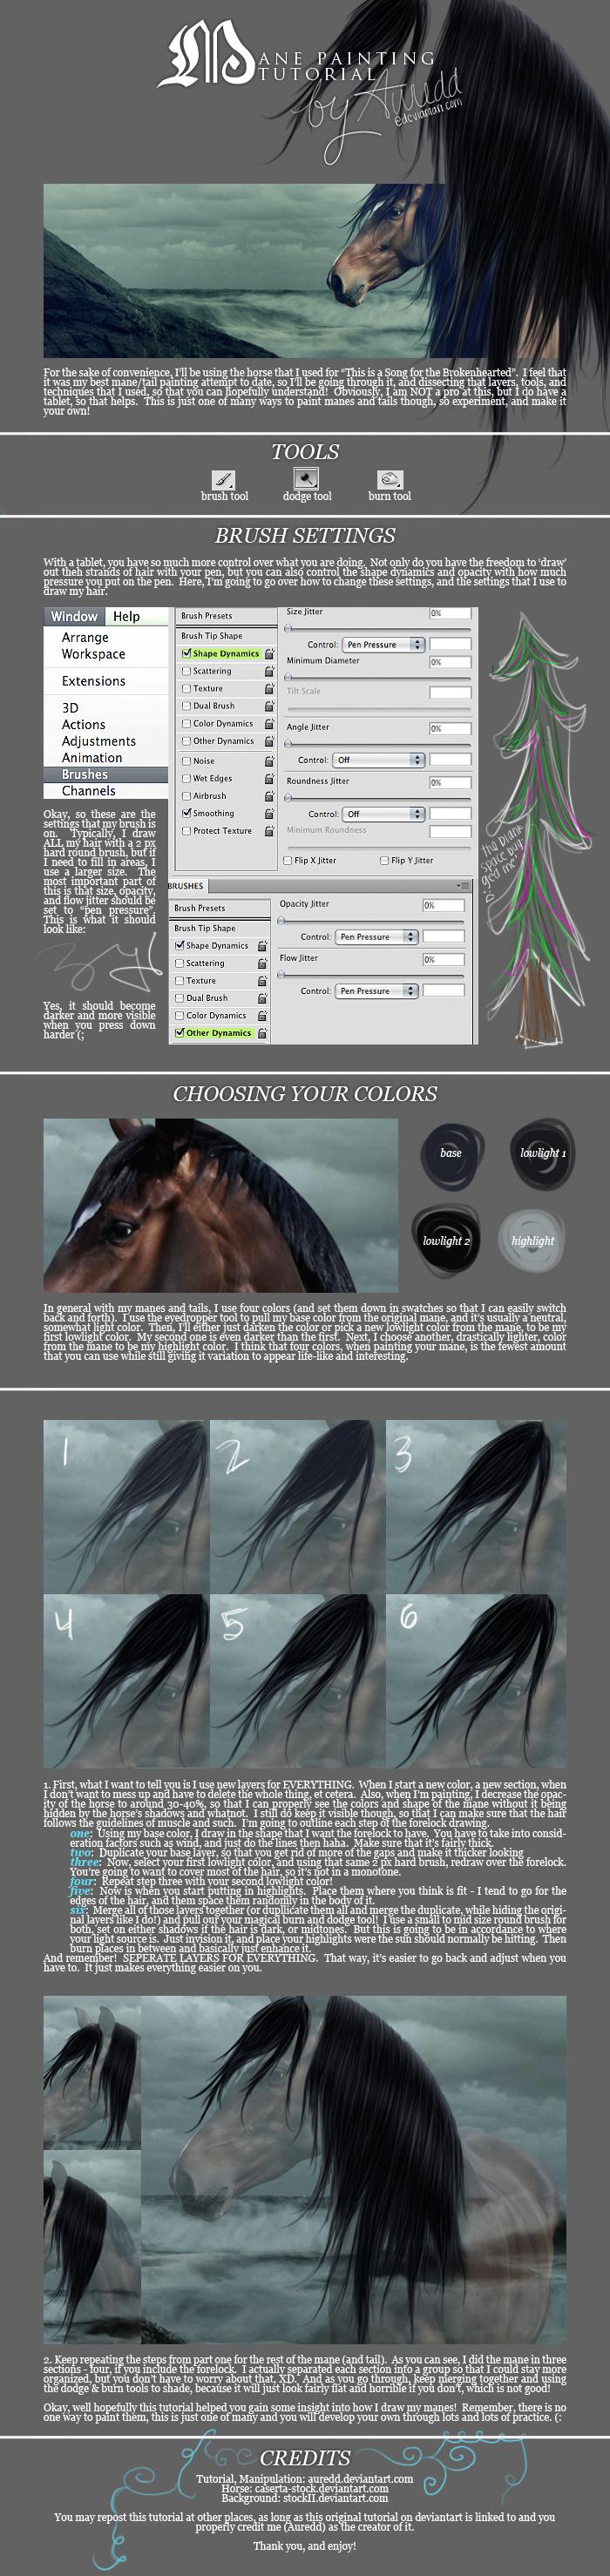 aur's mane painting tutorial